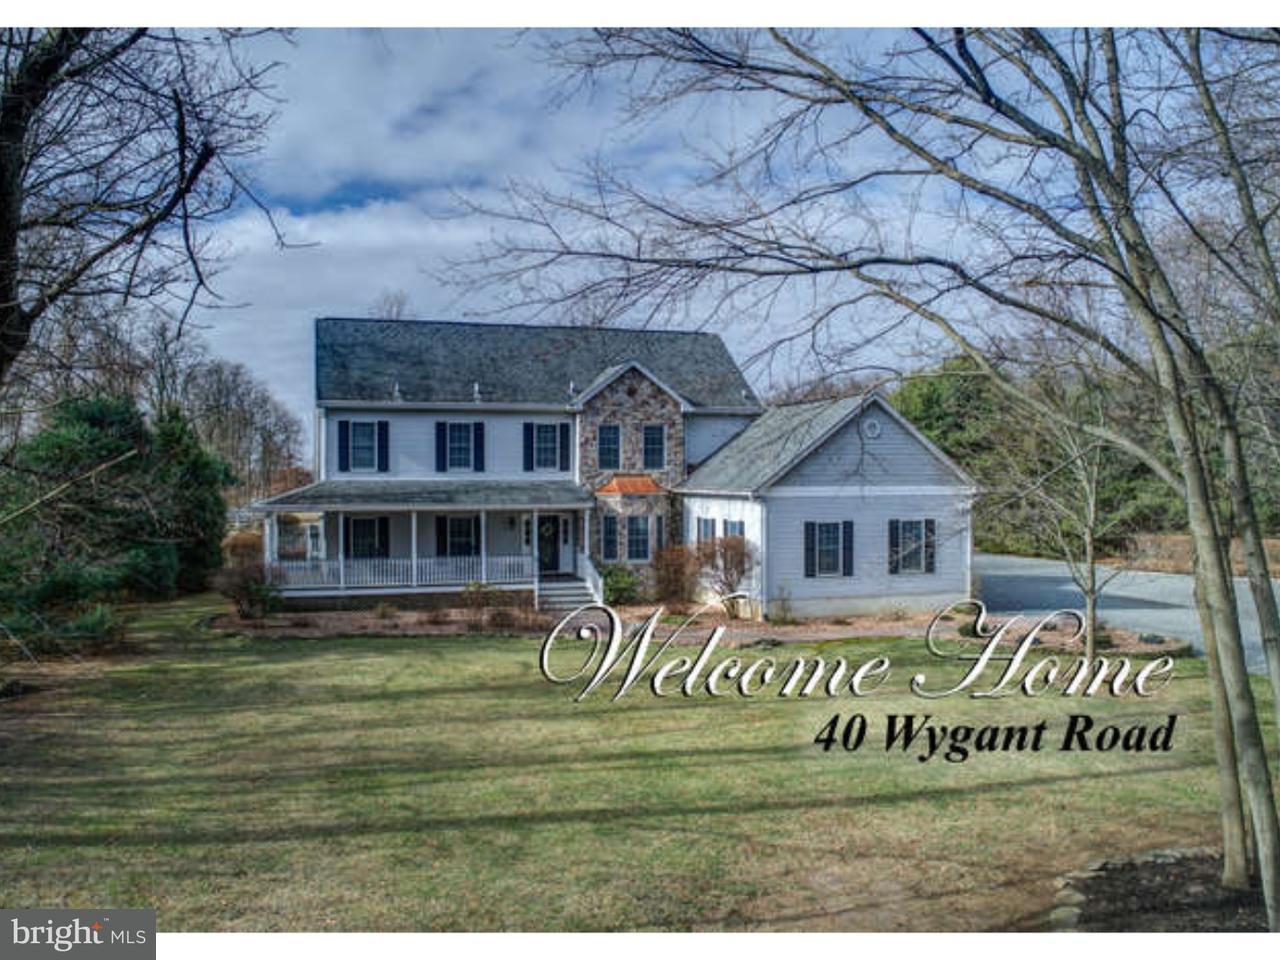 独户住宅 为 销售 在 40 WYGANT Road Cream Ridge, 新泽西州 08514 美国在/周边: Upper Freehold Township